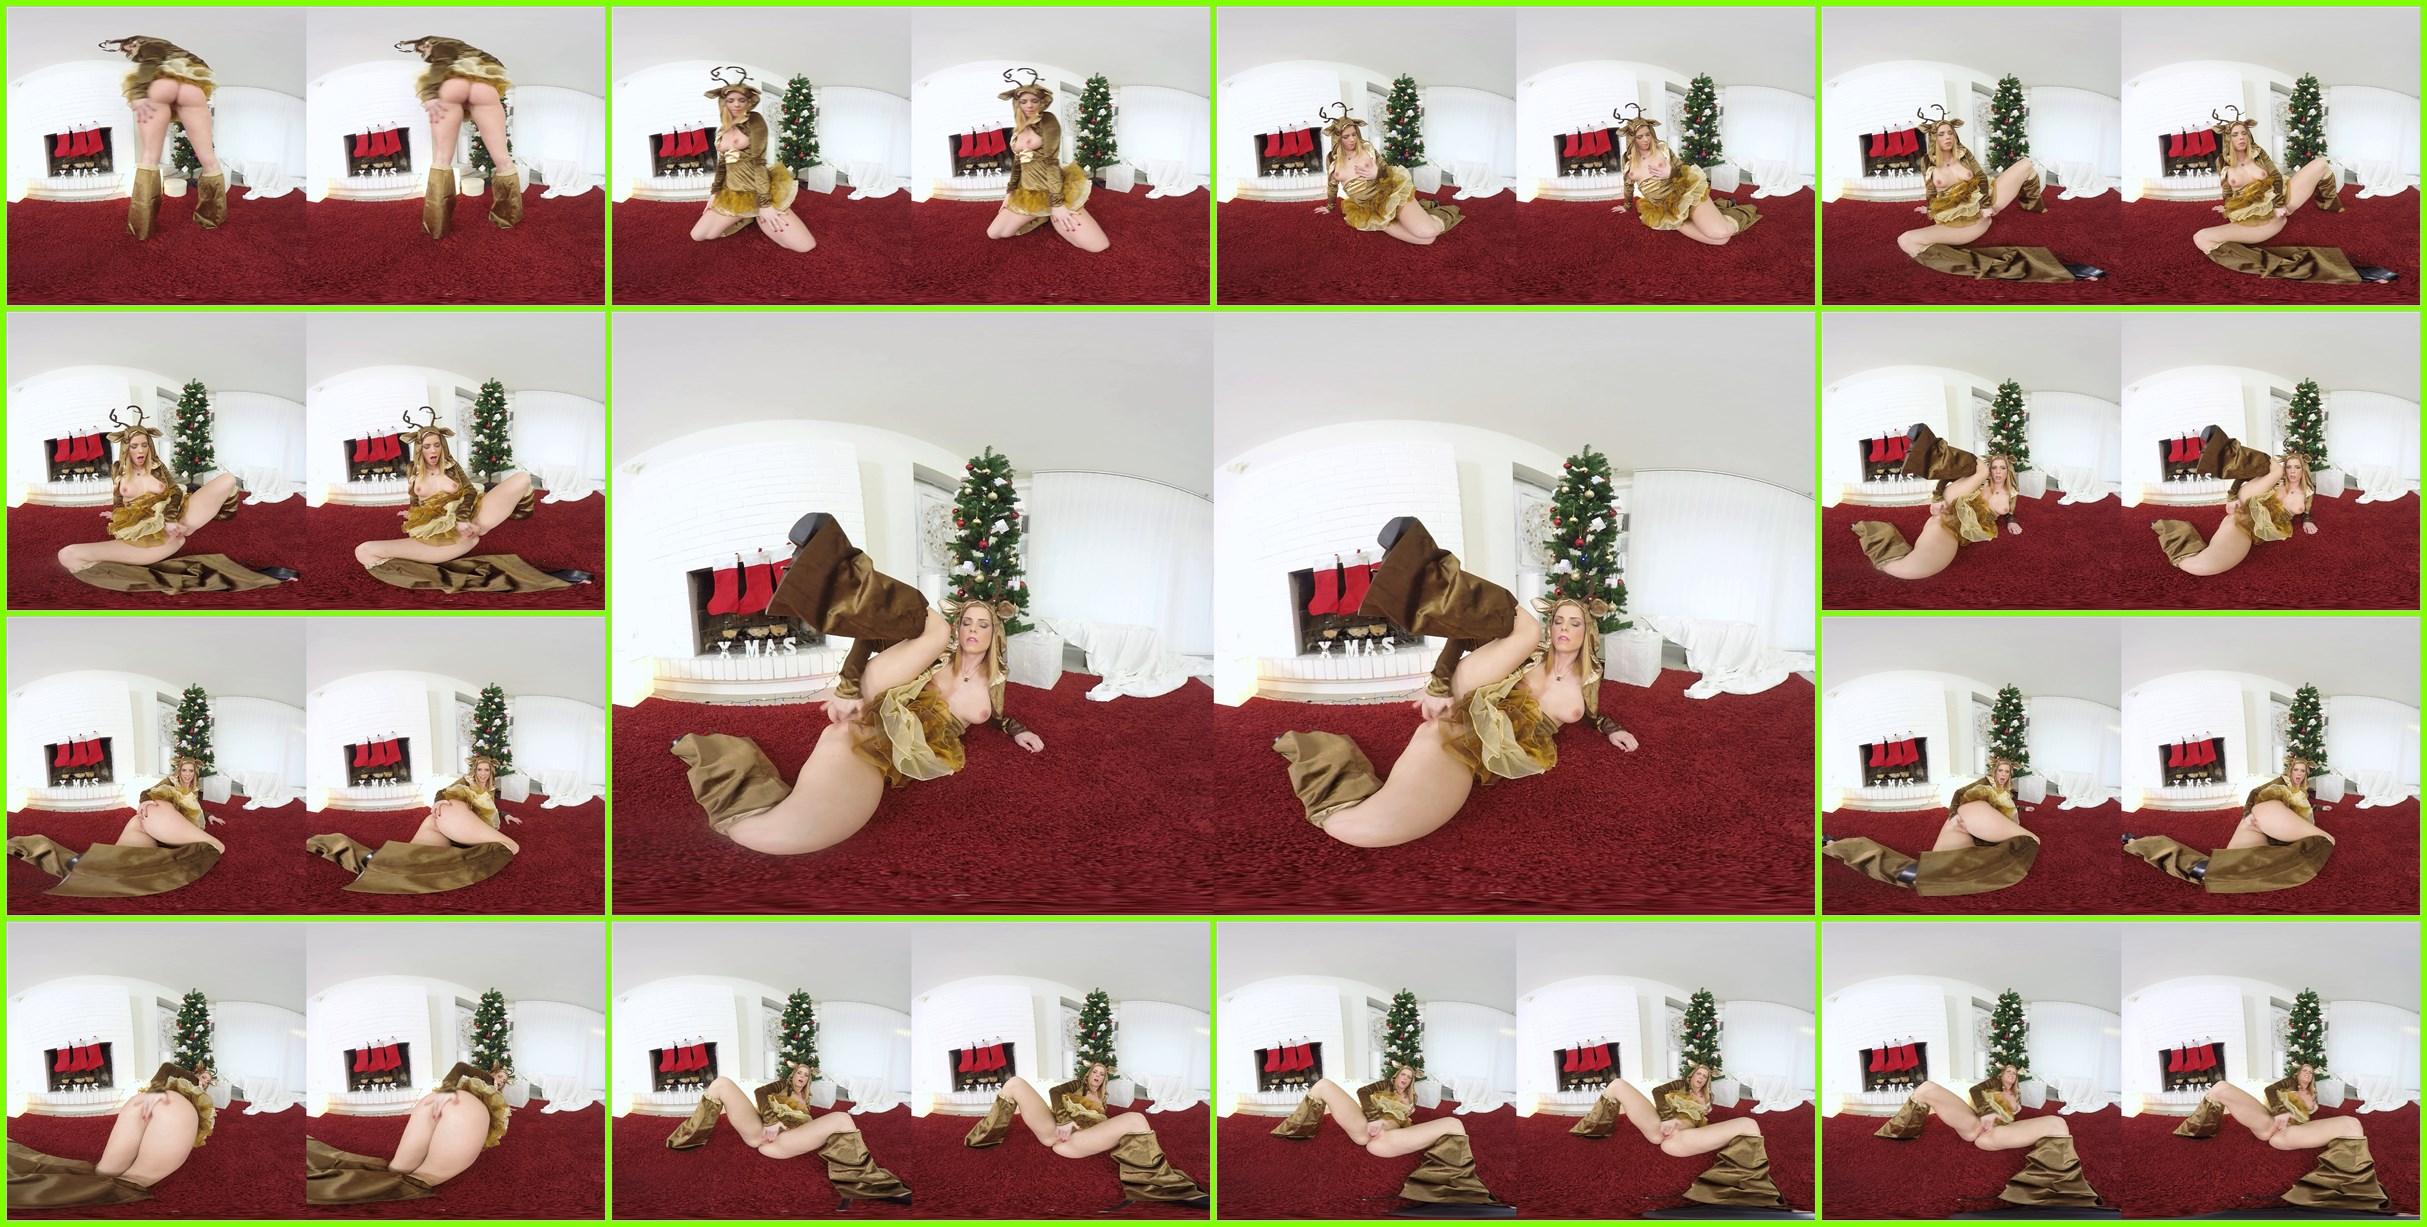 Virtual_223-Chrissy_Fox.jpg